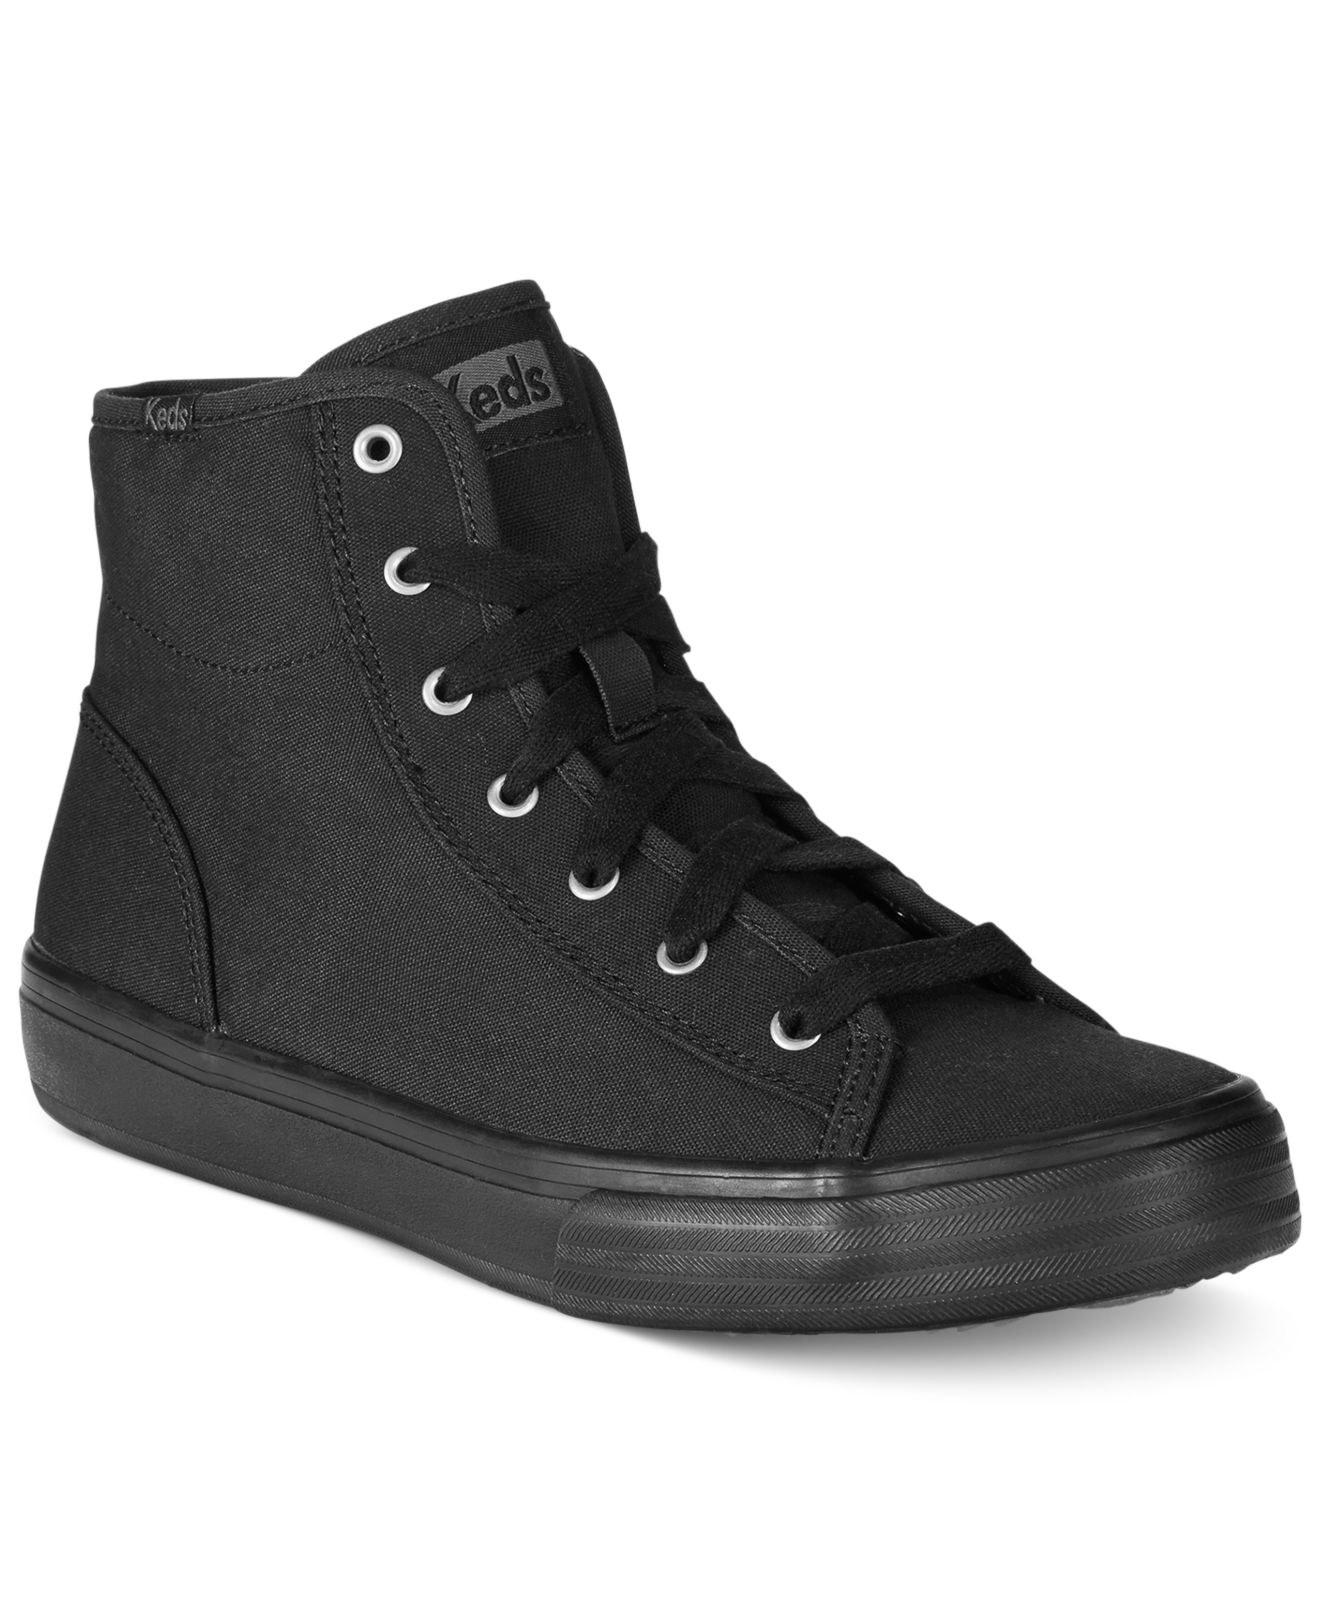 black high top keds Shop Clothing